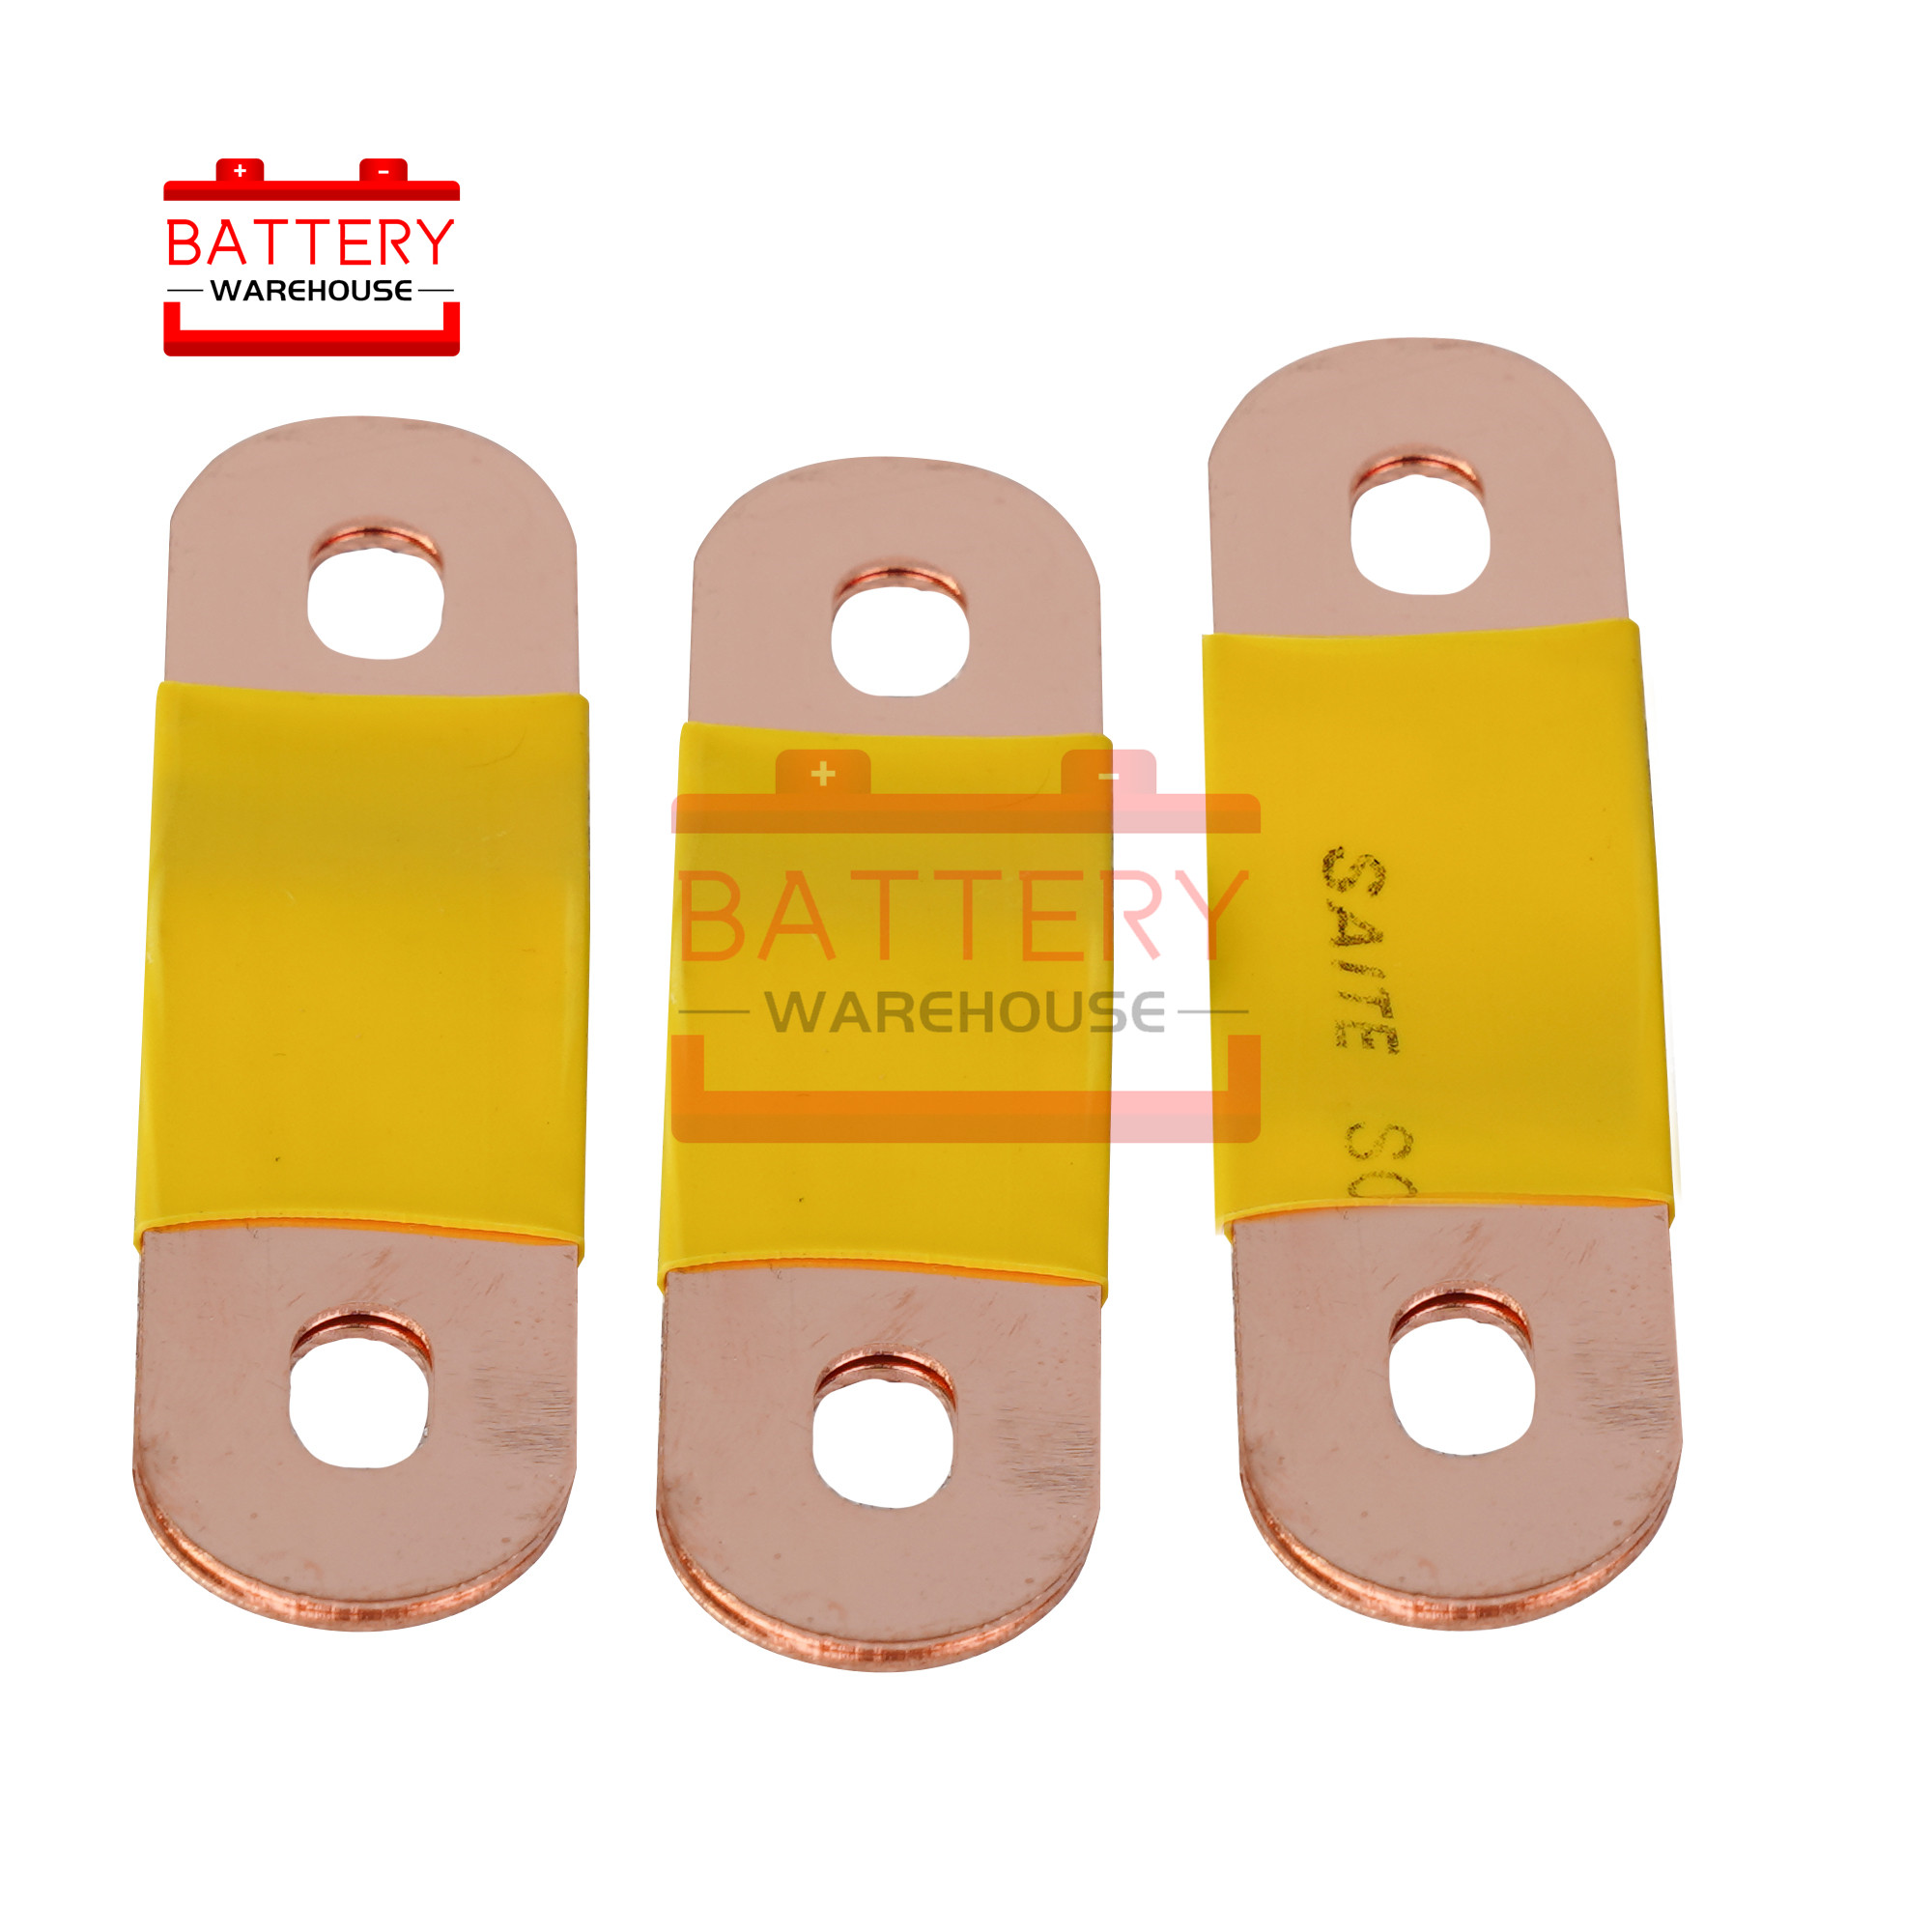 PURE Copper Bus Bar Terminal Connectors For lithium 3.7V CATL 3.2V 3.7V 12V 24v 48V lifepo4 battery 100AH 200AH 300AH 400AH|Replacement Batteries| |  - title=